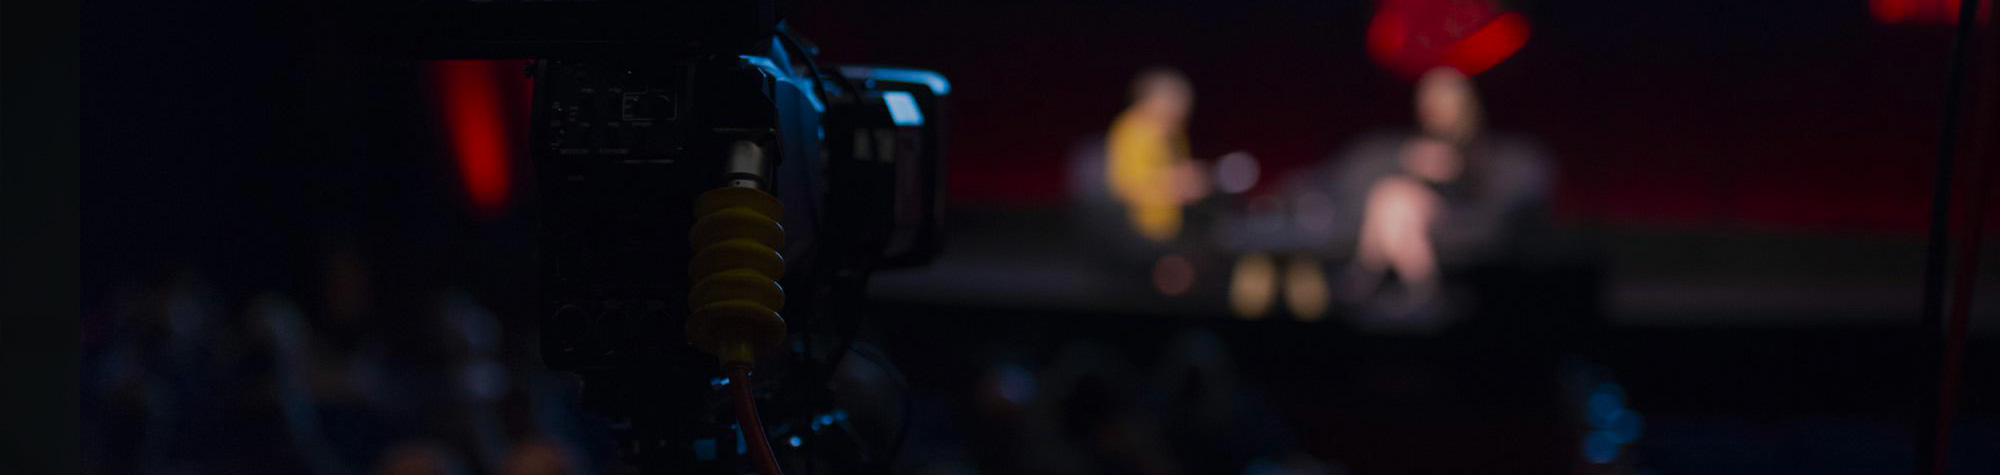 SSIMWAVE Debuts SSIMPLUS VOD Monitor Inspector At IBC2019